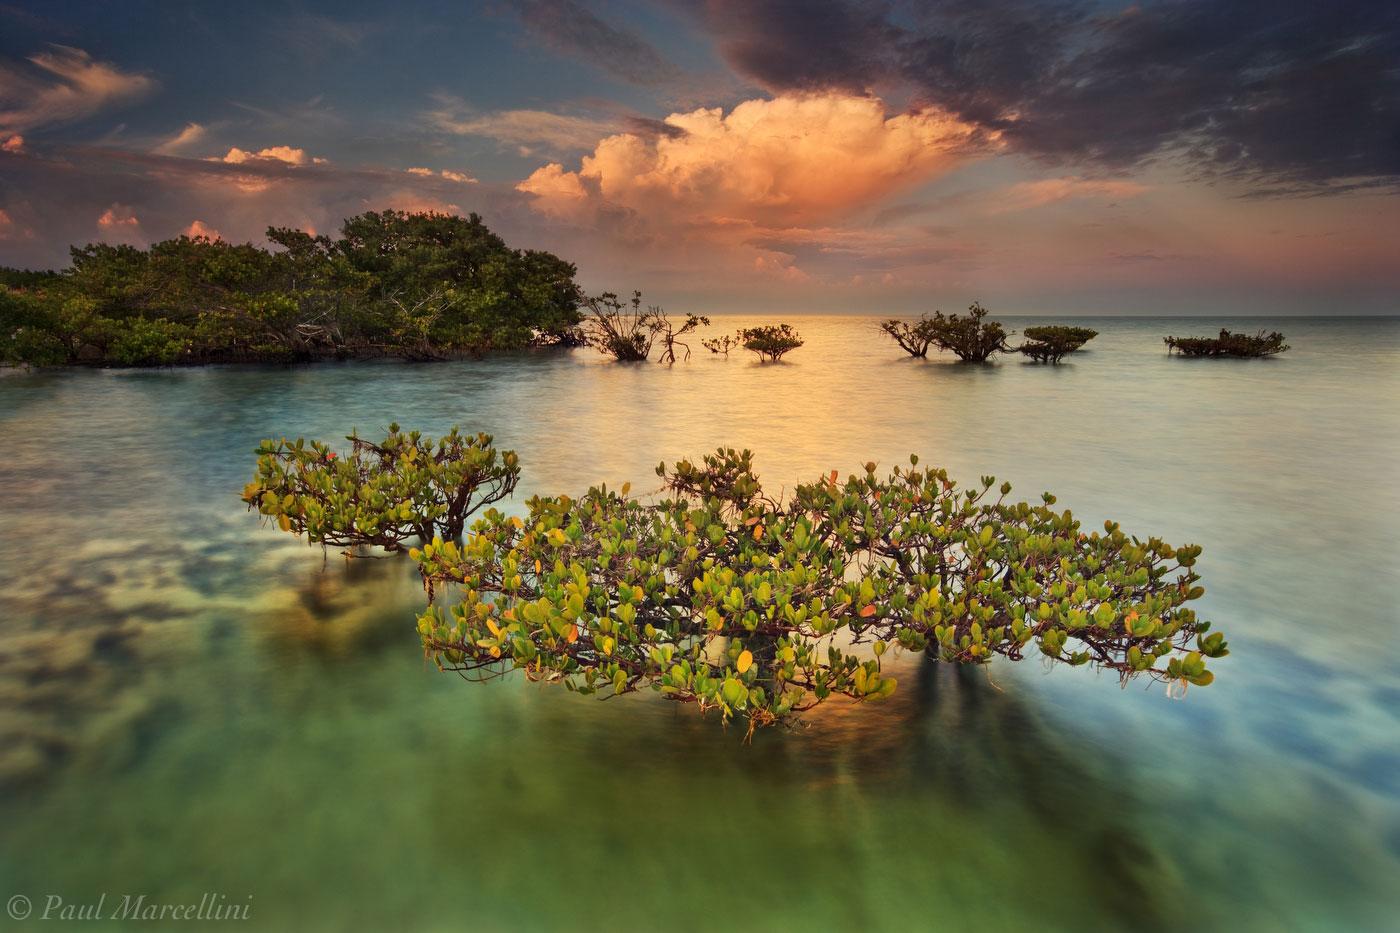 mangrove, biscayne national park, sunset, thunderstorm, atlantic ocean, awarded, florida, south florida, nature, photography, photo